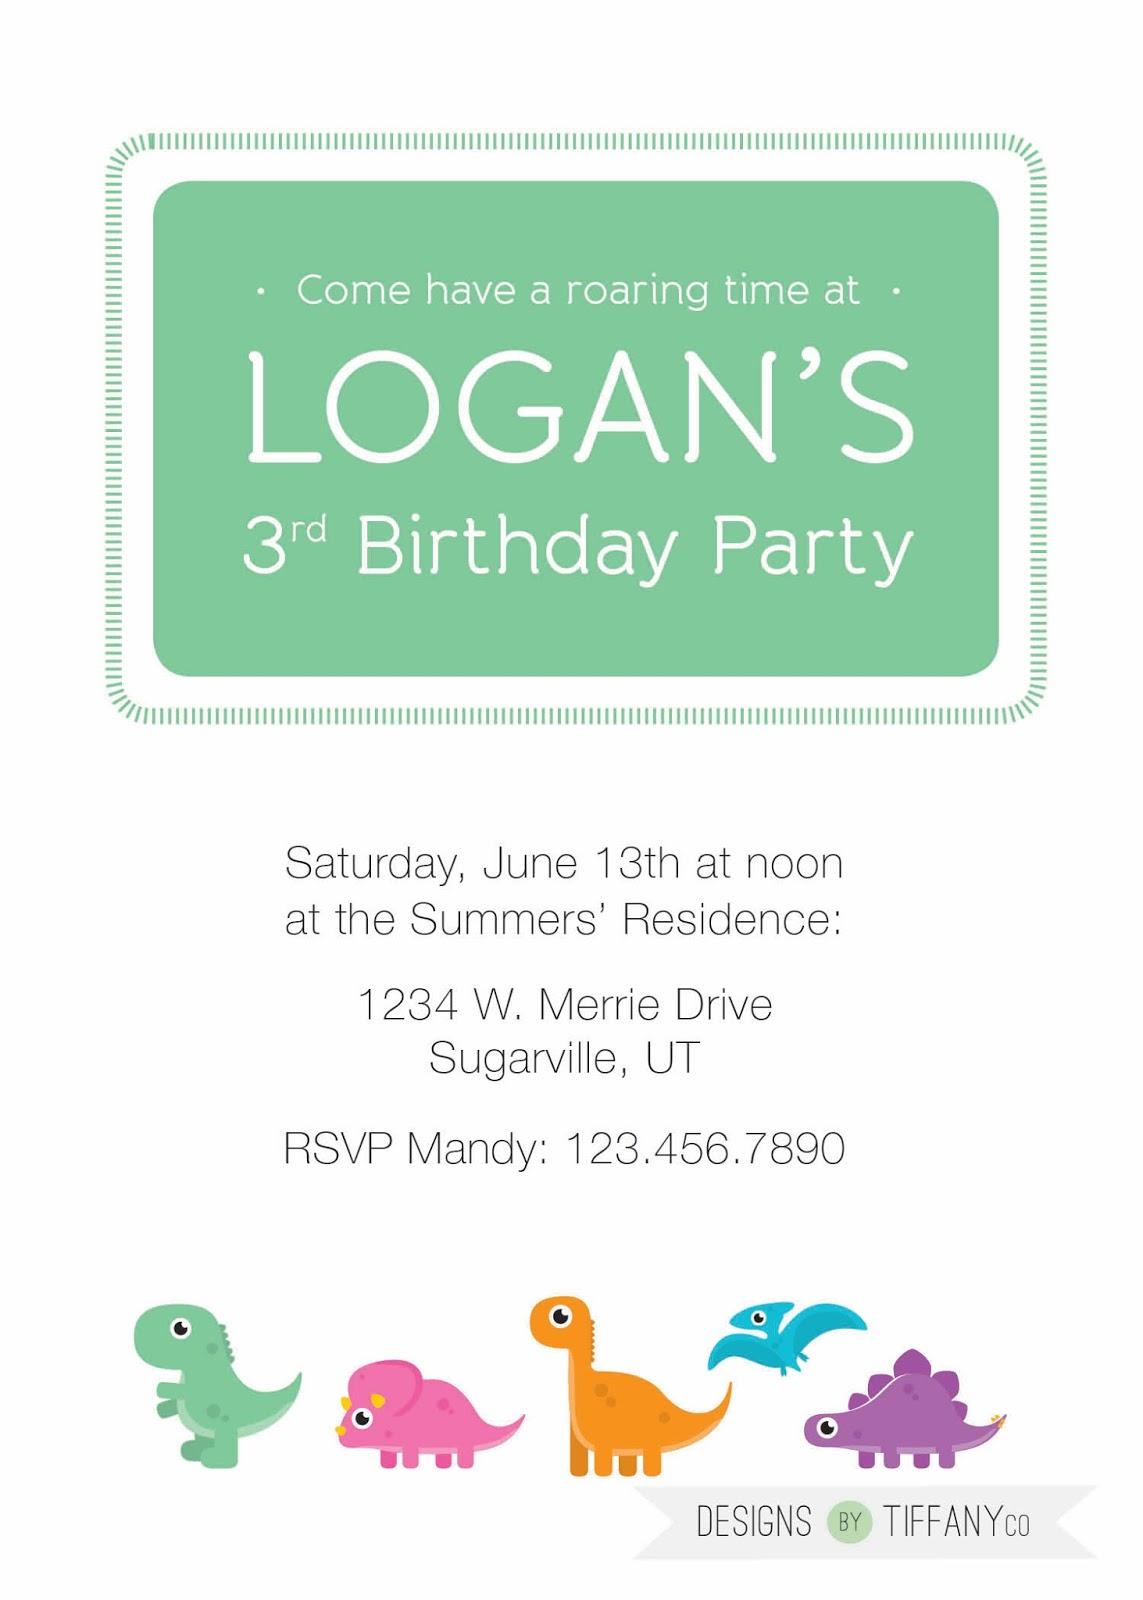 Dinosaur Birthday Party Invitation - Designs by TiffanyCo